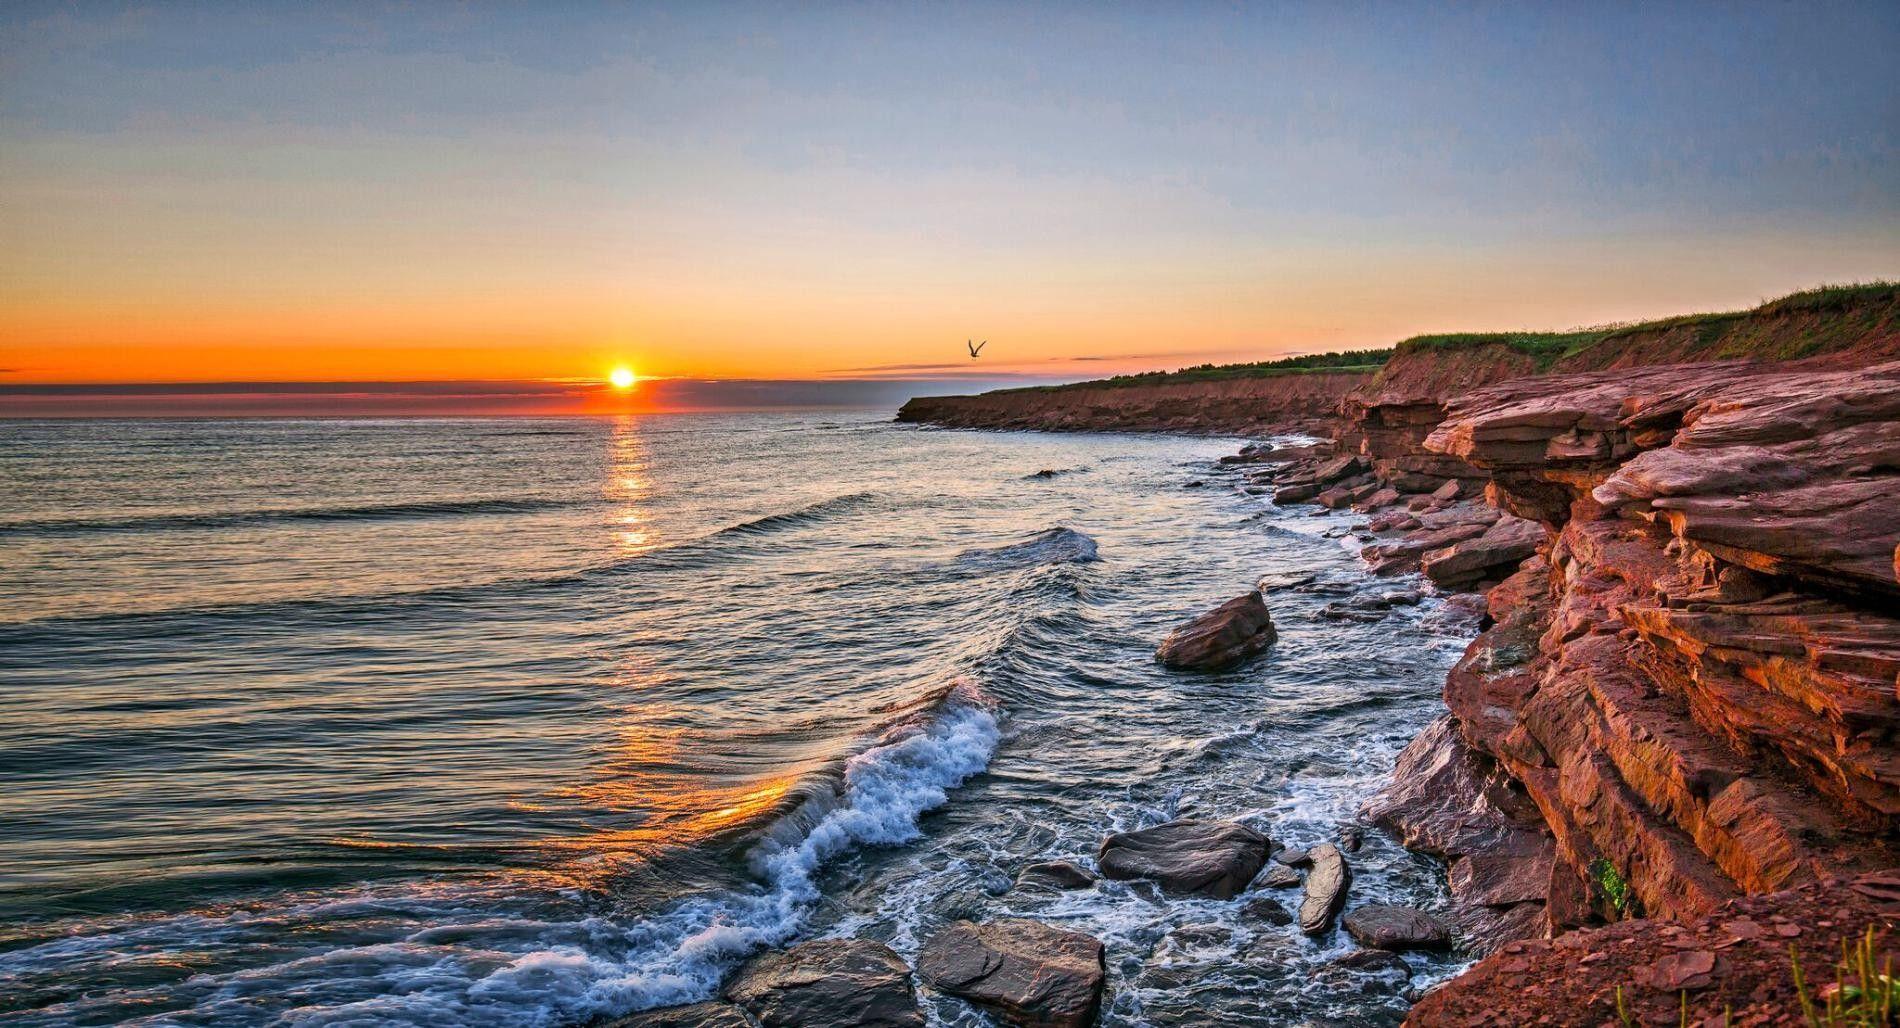 Sonnenuntergang über Cavendish Beach auf Prince Edward Island.